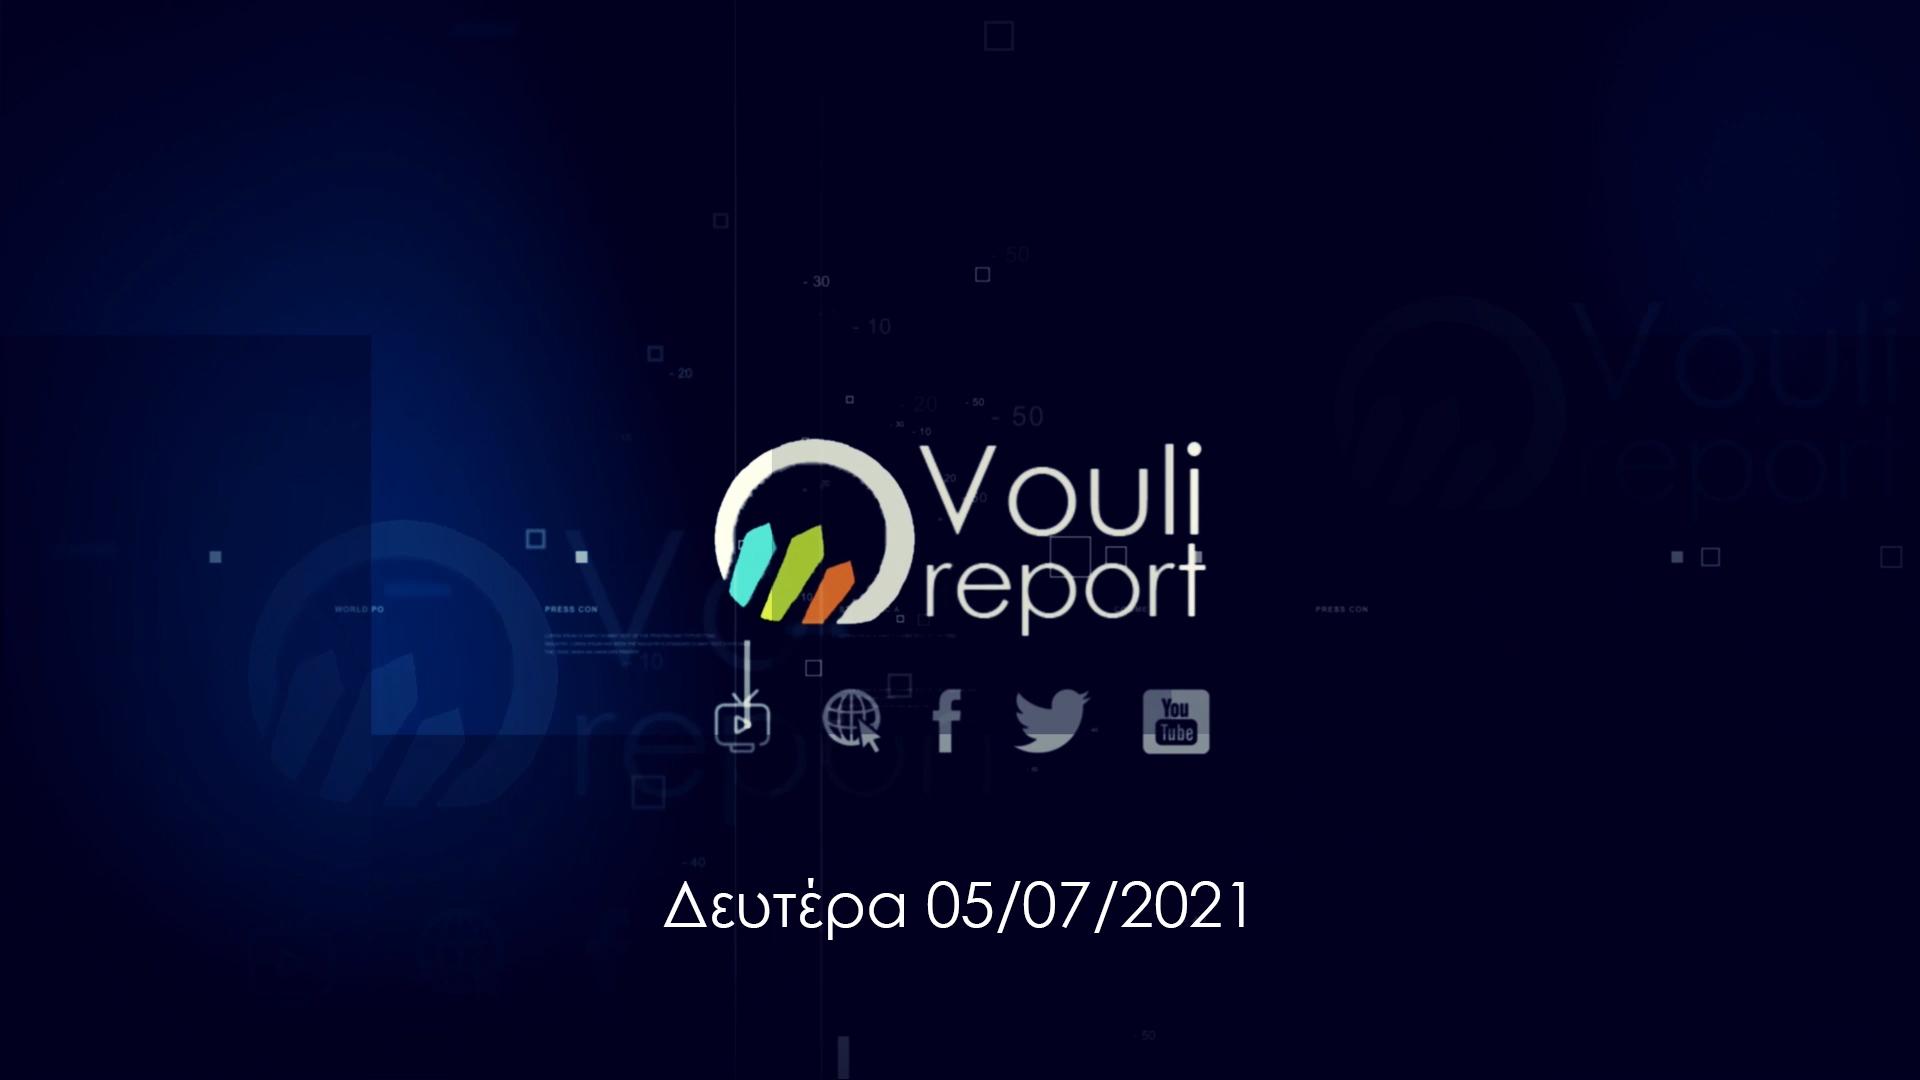 Vouli report | 05/07/2021, 6μμ